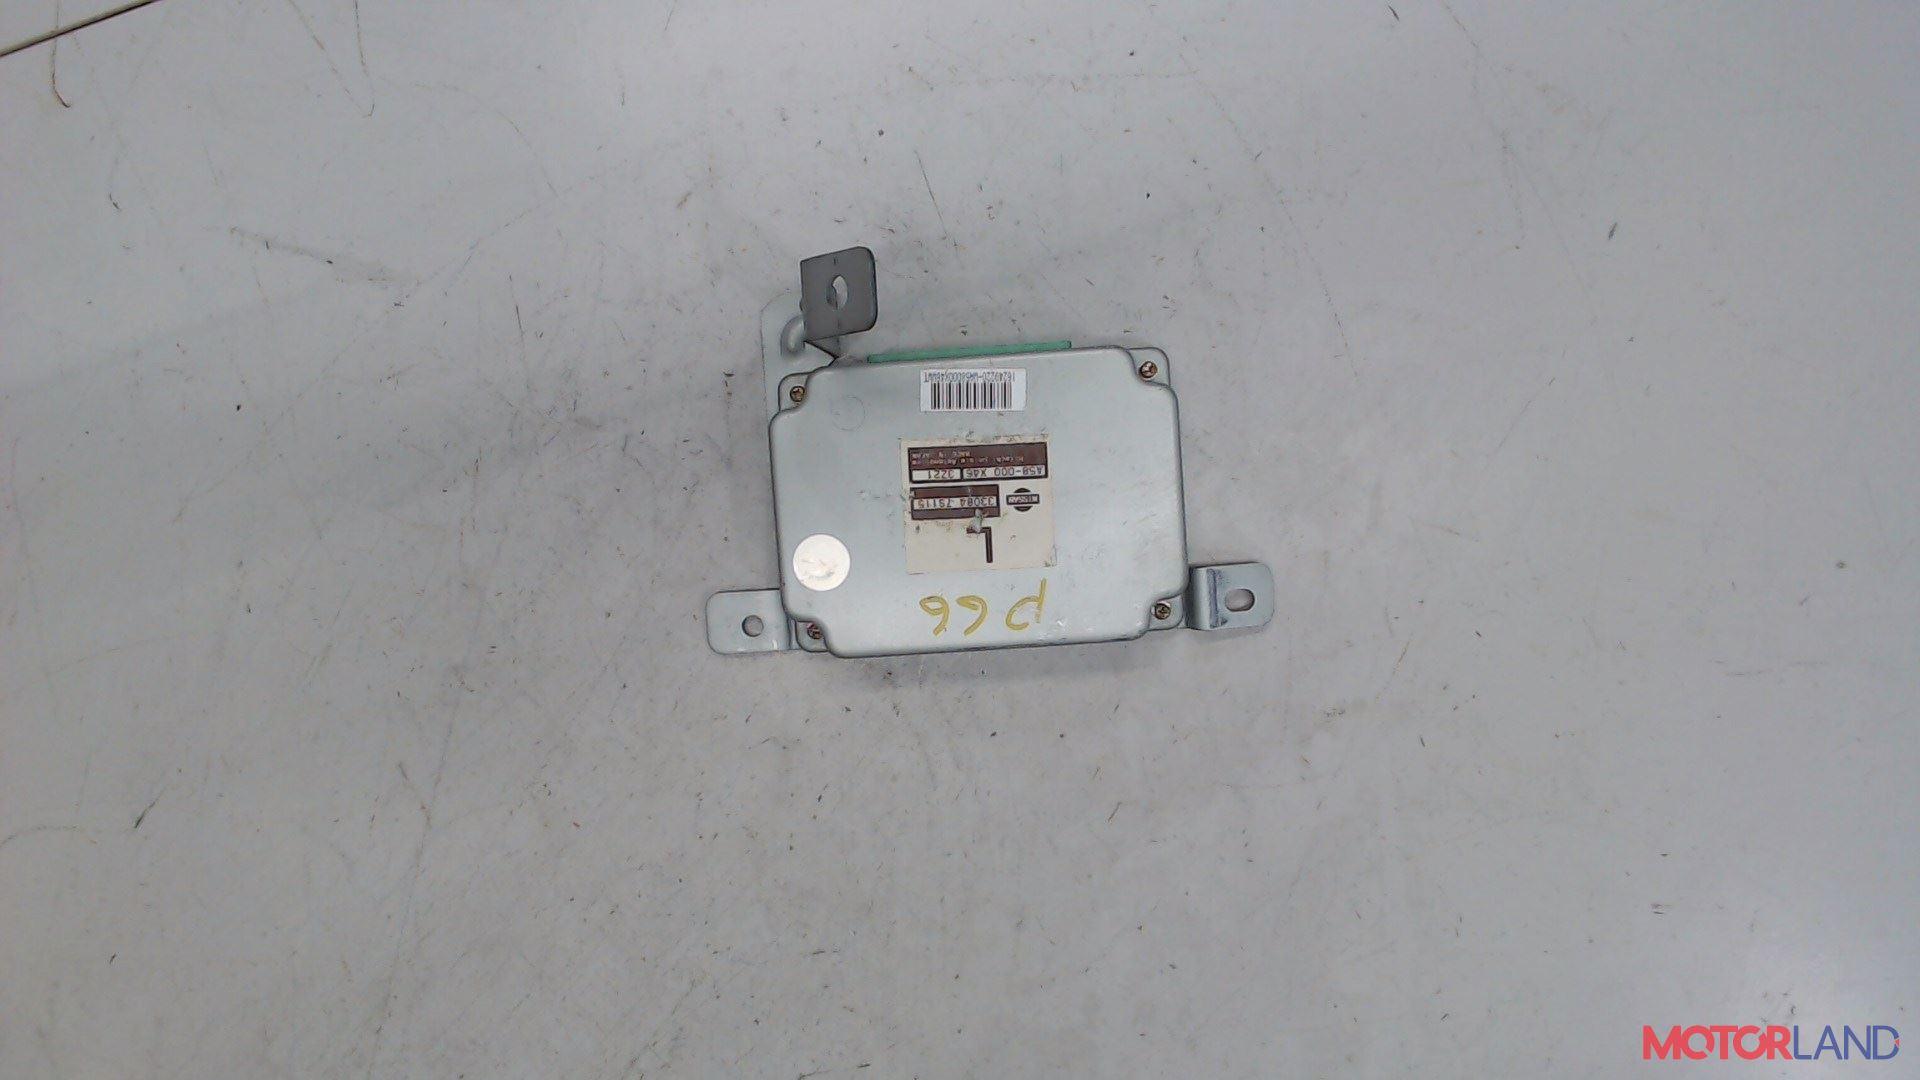 Блок управления (ЭБУ) Infiniti QX56 (JA60) 2004-2010, [КонстрНомер-Артикул] #1